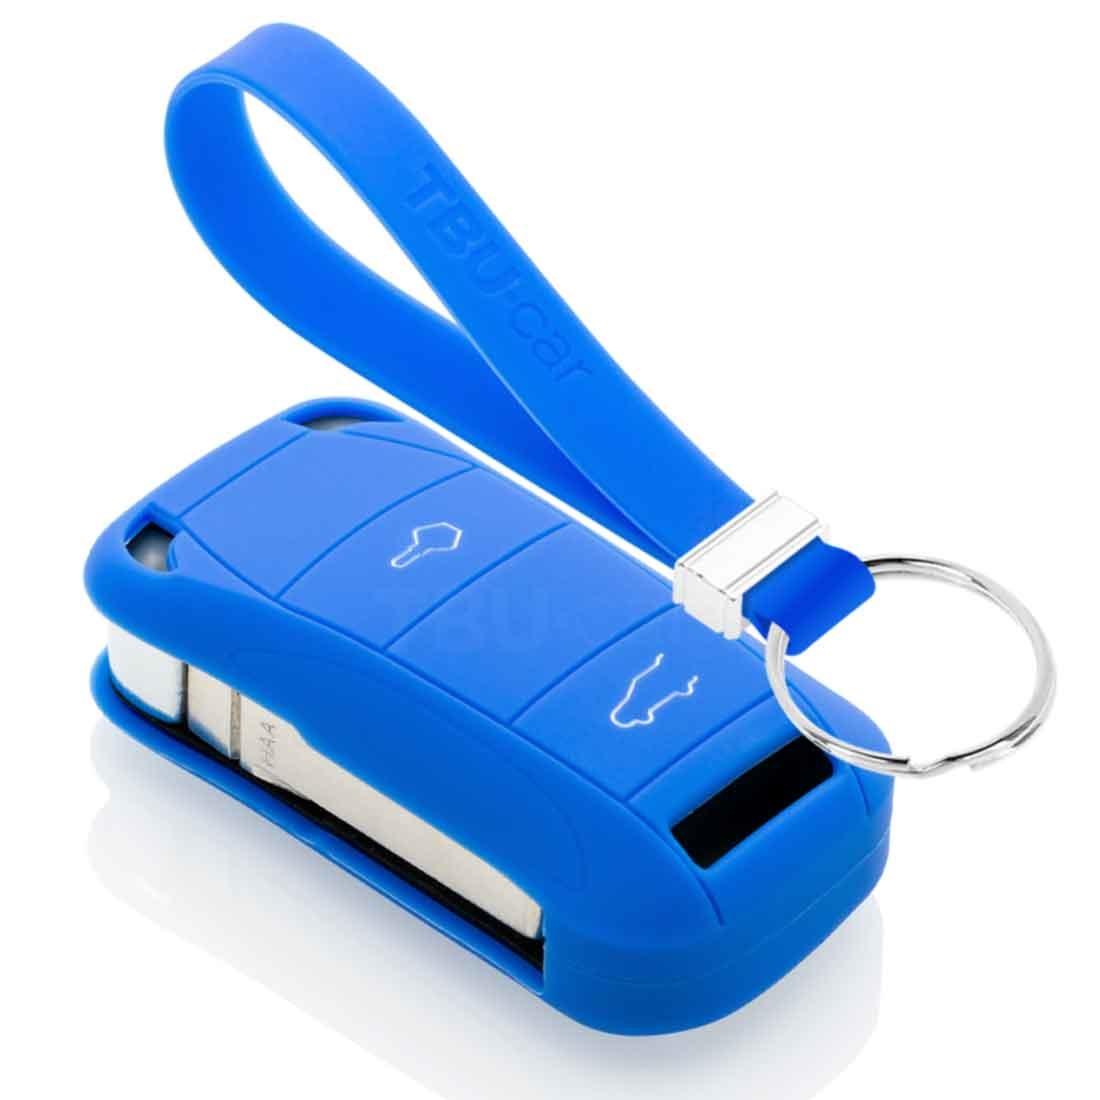 TBU car TBU car Sleutel cover compatibel met Porsche - Silicone sleutelhoesje - beschermhoesje autosleutel - Blauw